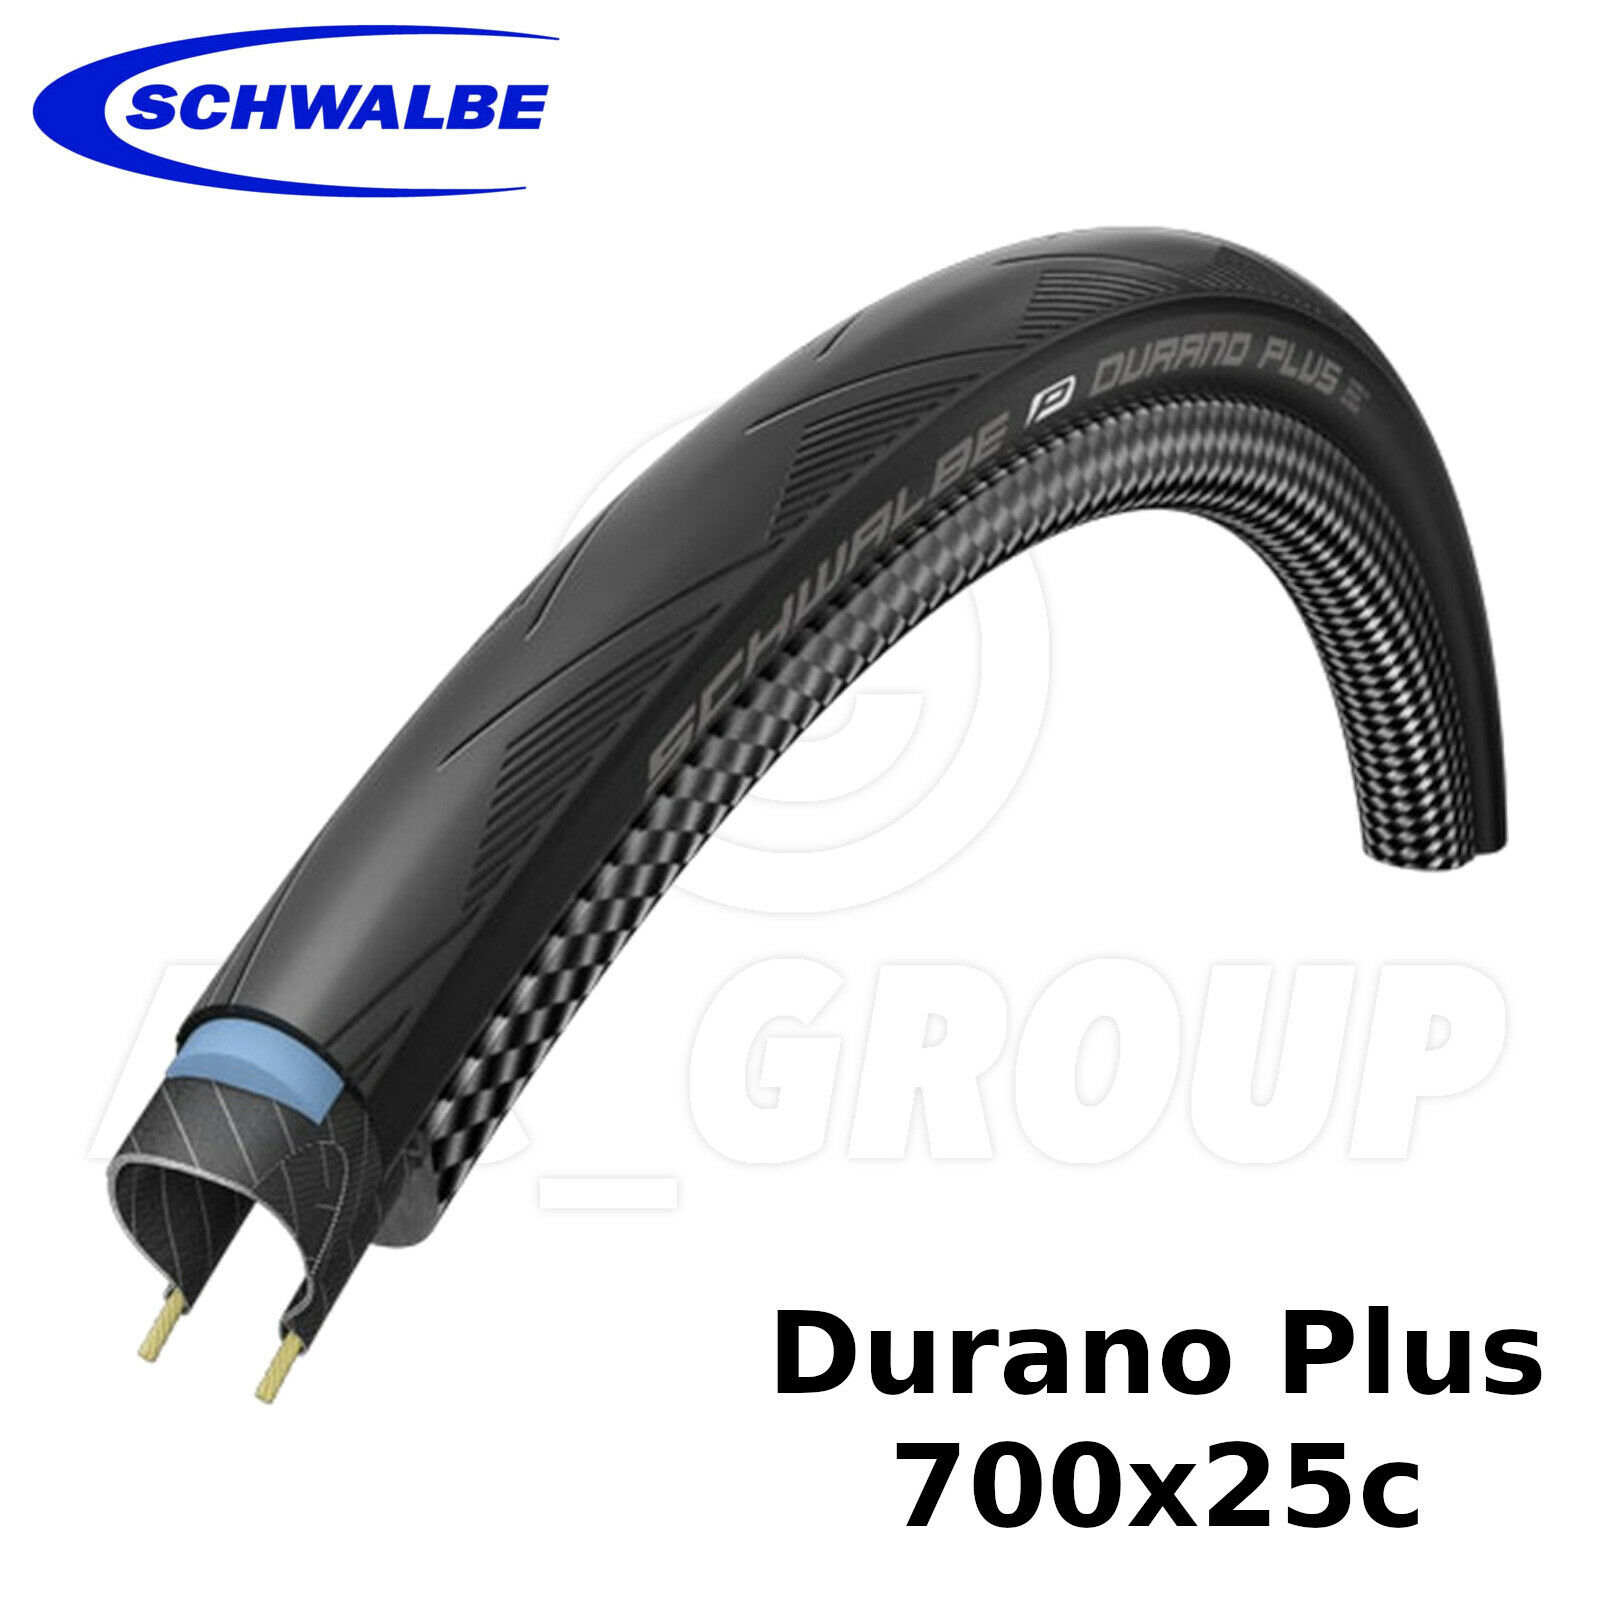 Schwalbe Durano Plus - 700x25c (25-622) - Smartguard, Filé , Pneu de Route Vélo